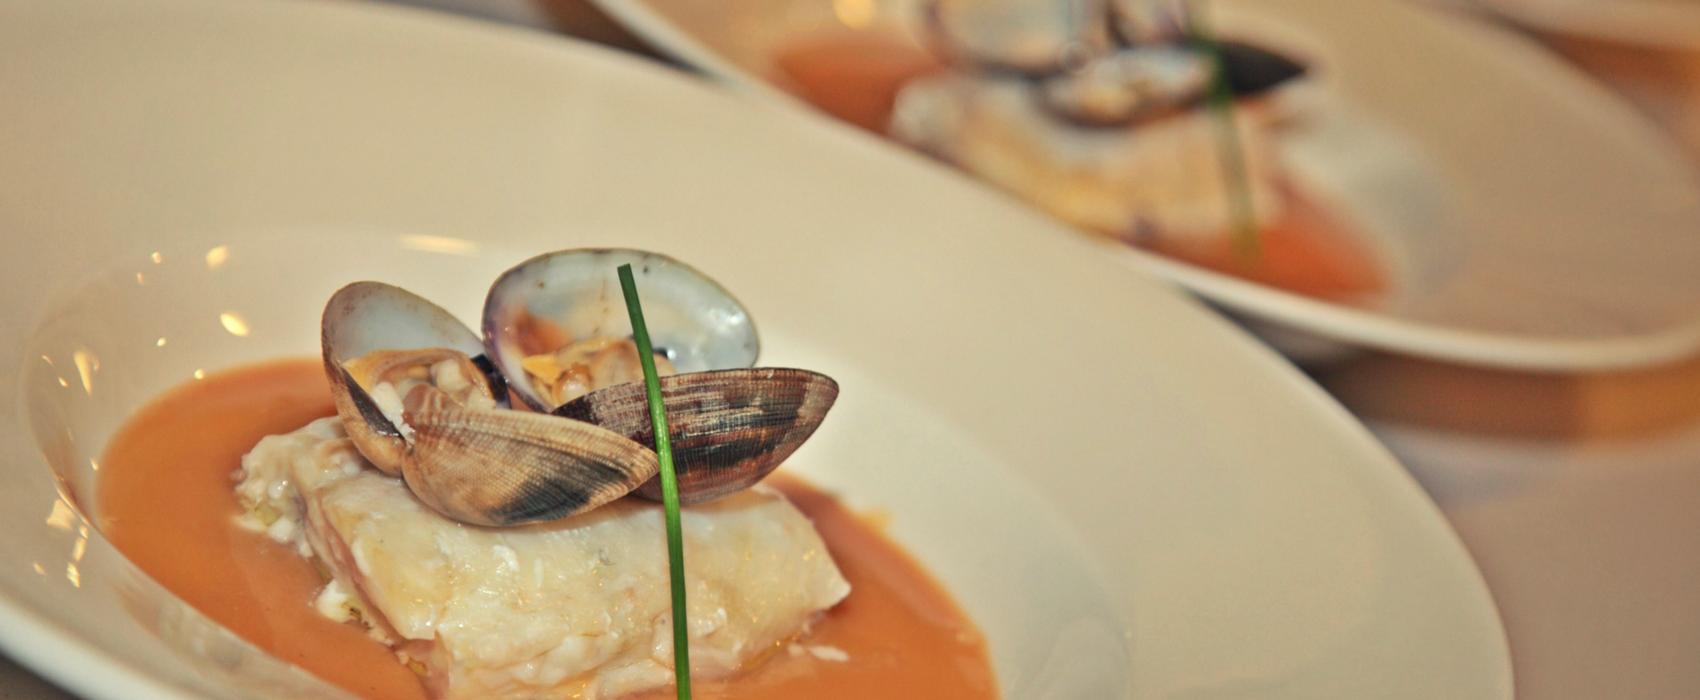 Gastronomía en Eventos